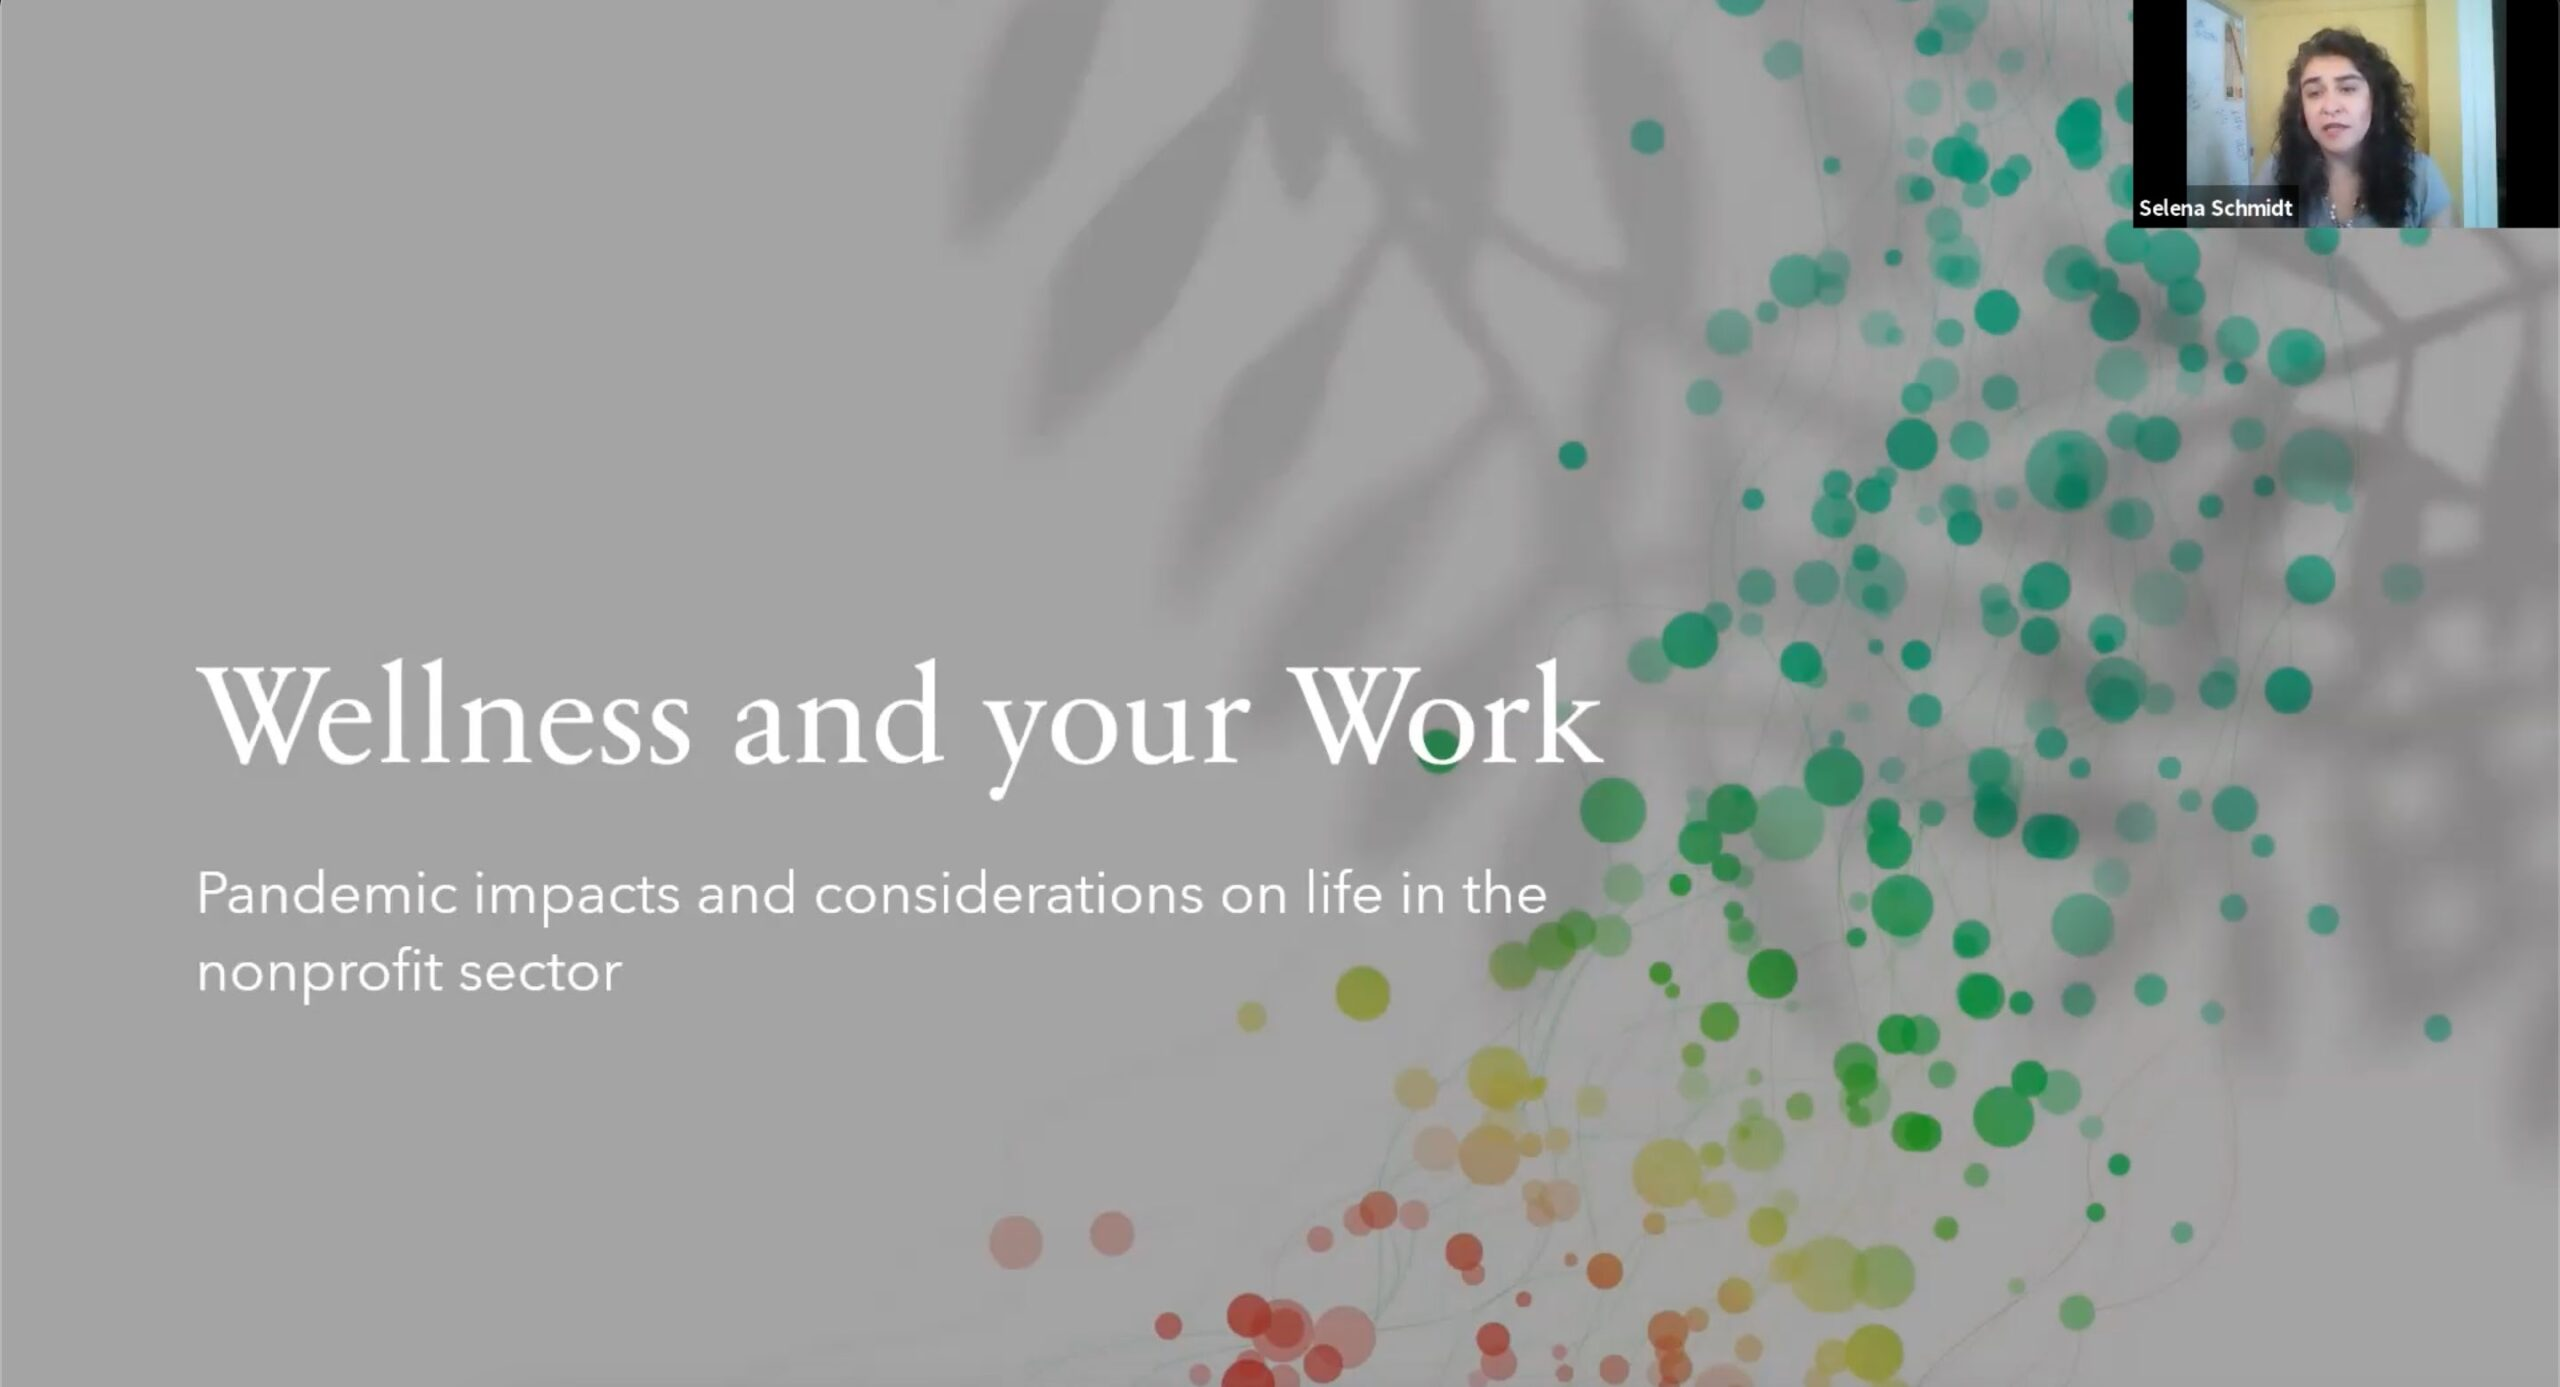 Wellness and Work Slide